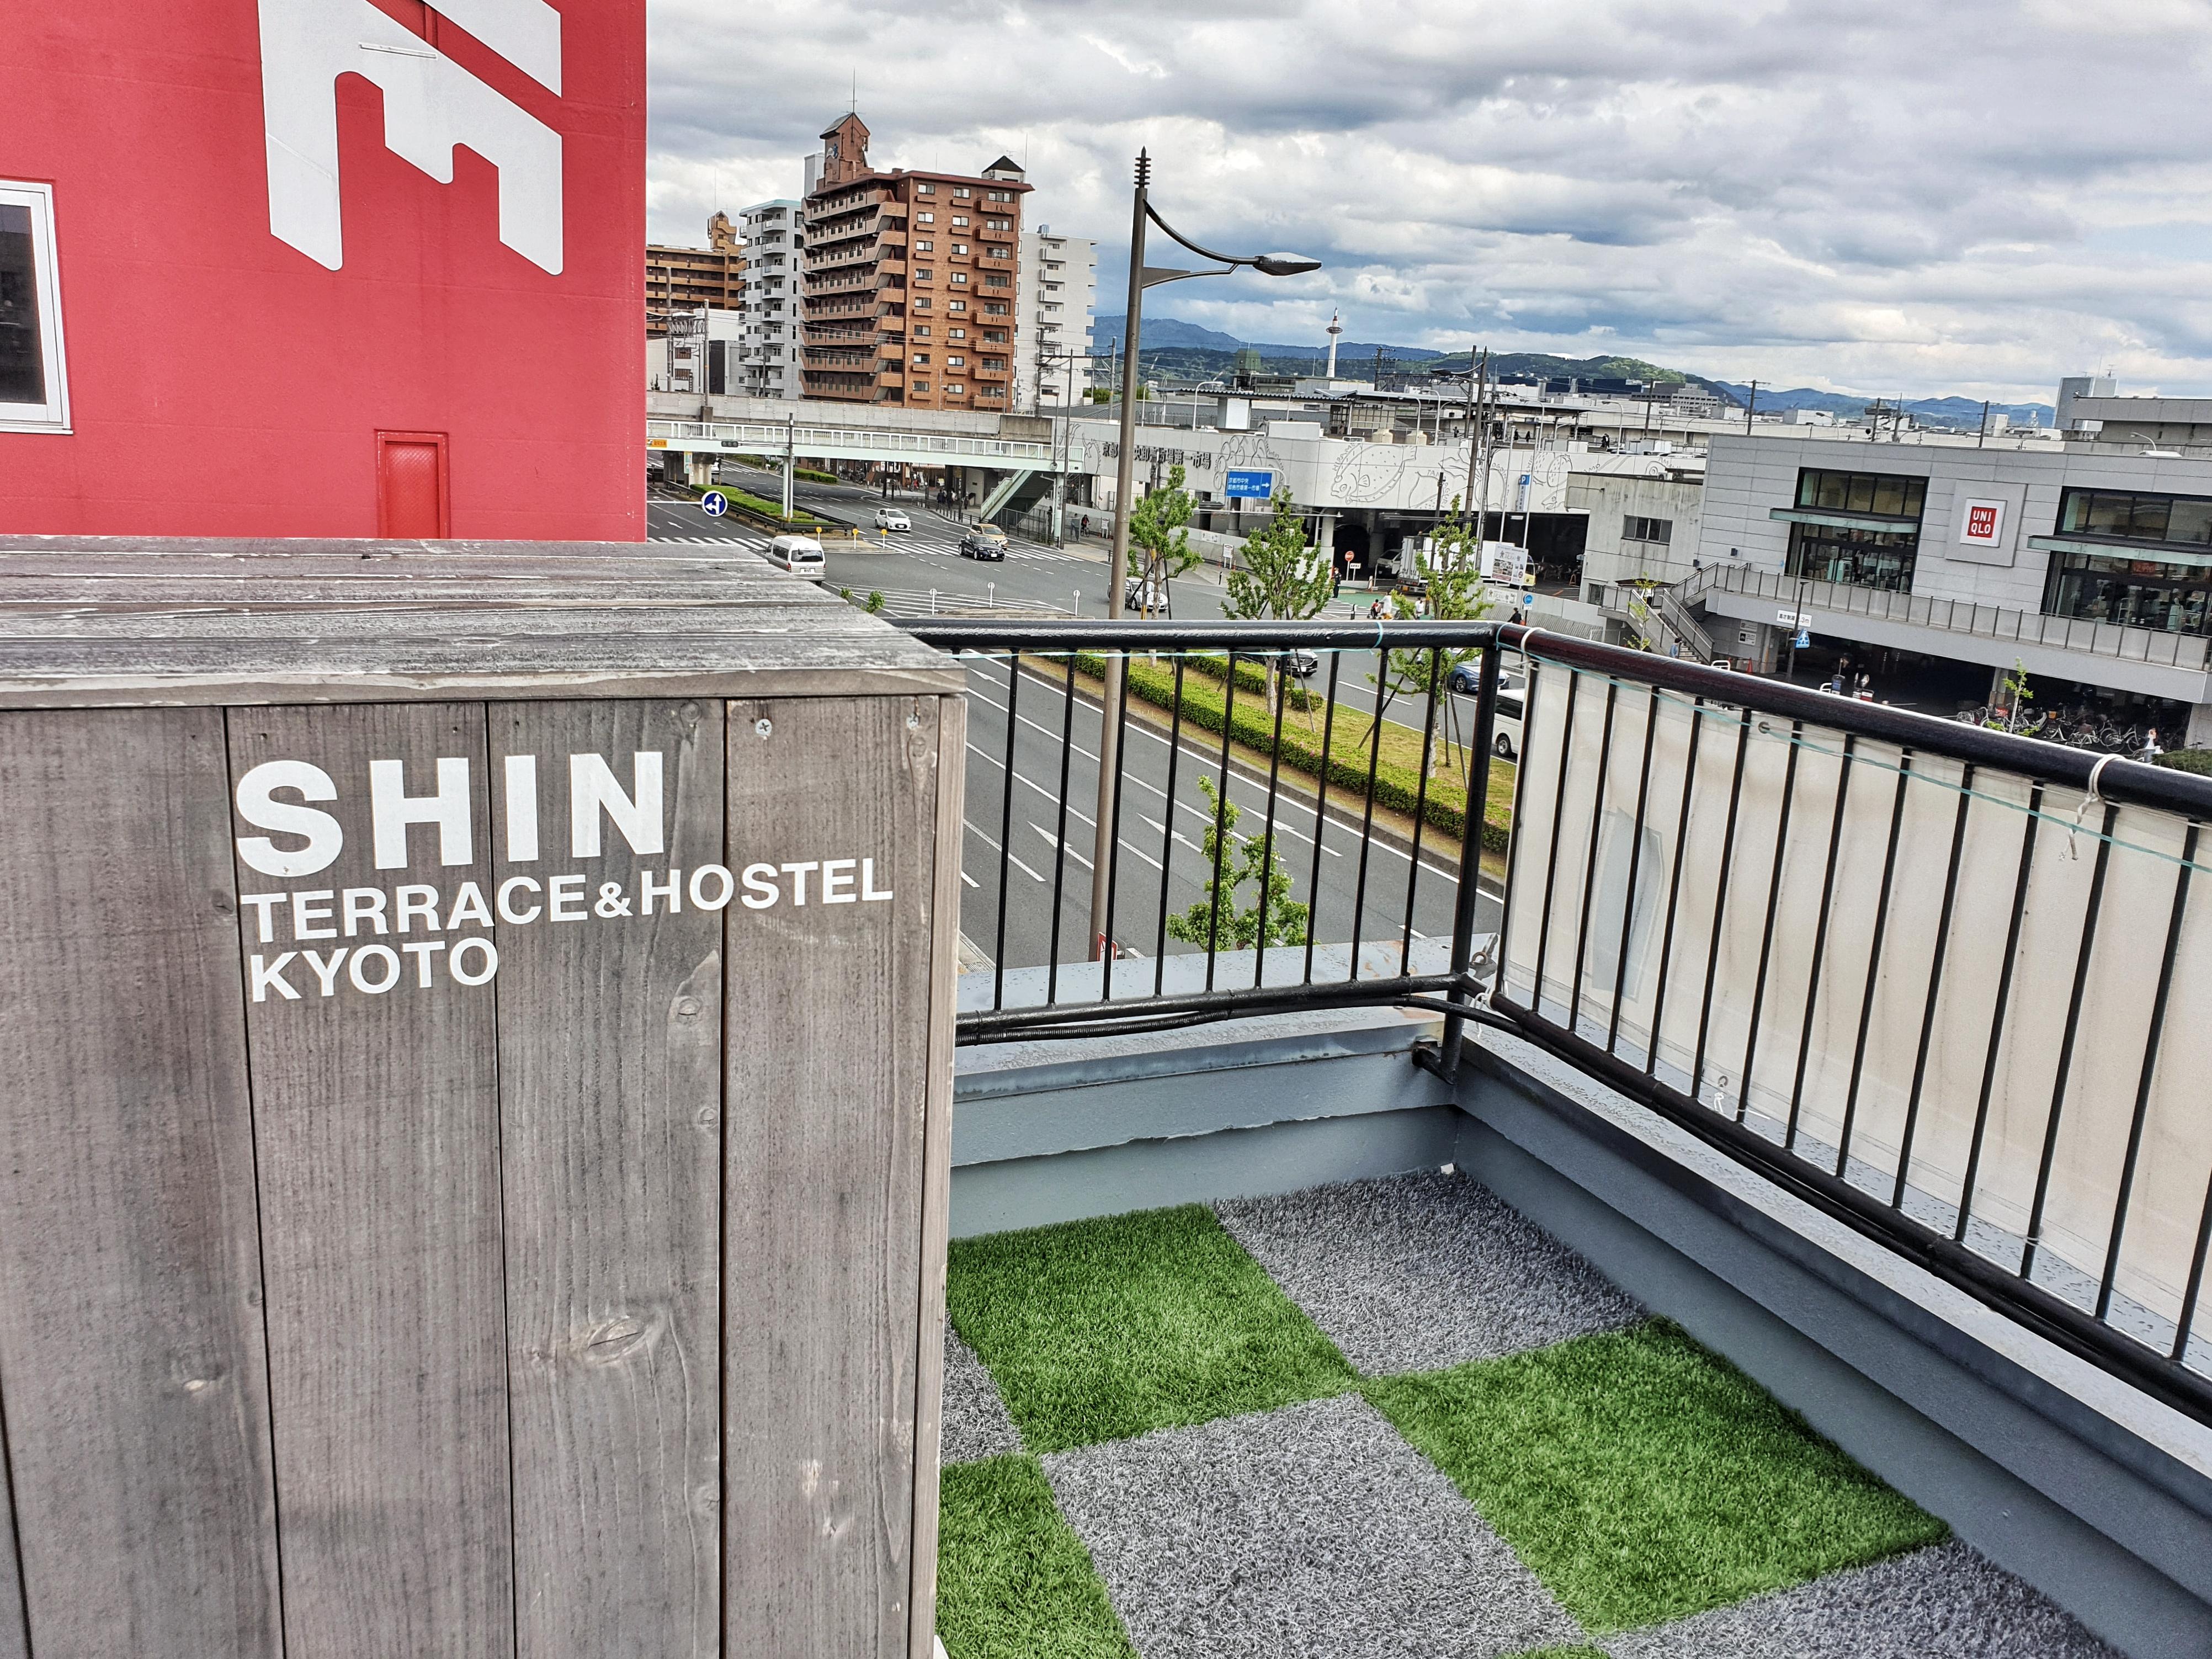 Shin Terrace and Hostel, Kyoto, Japan